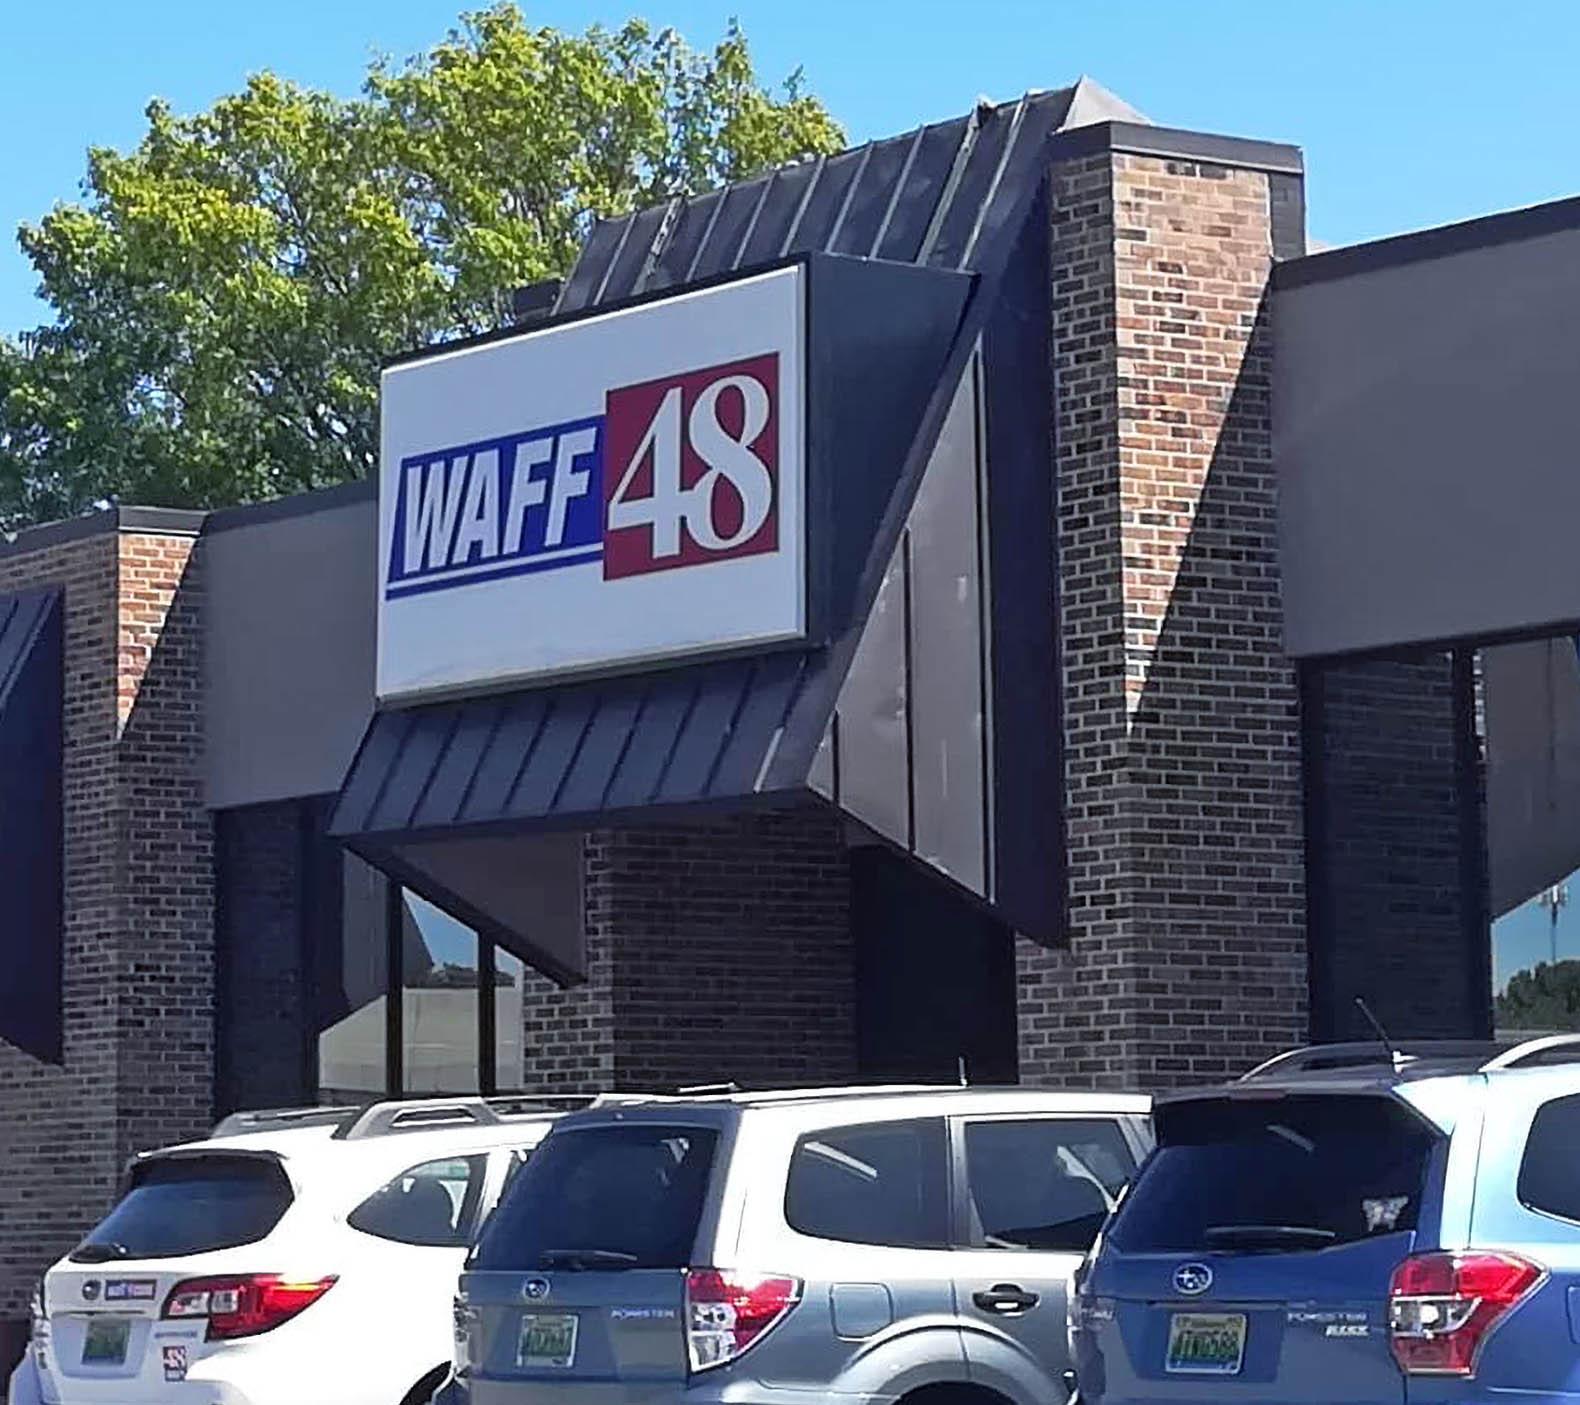 WAFF 48 News studio location